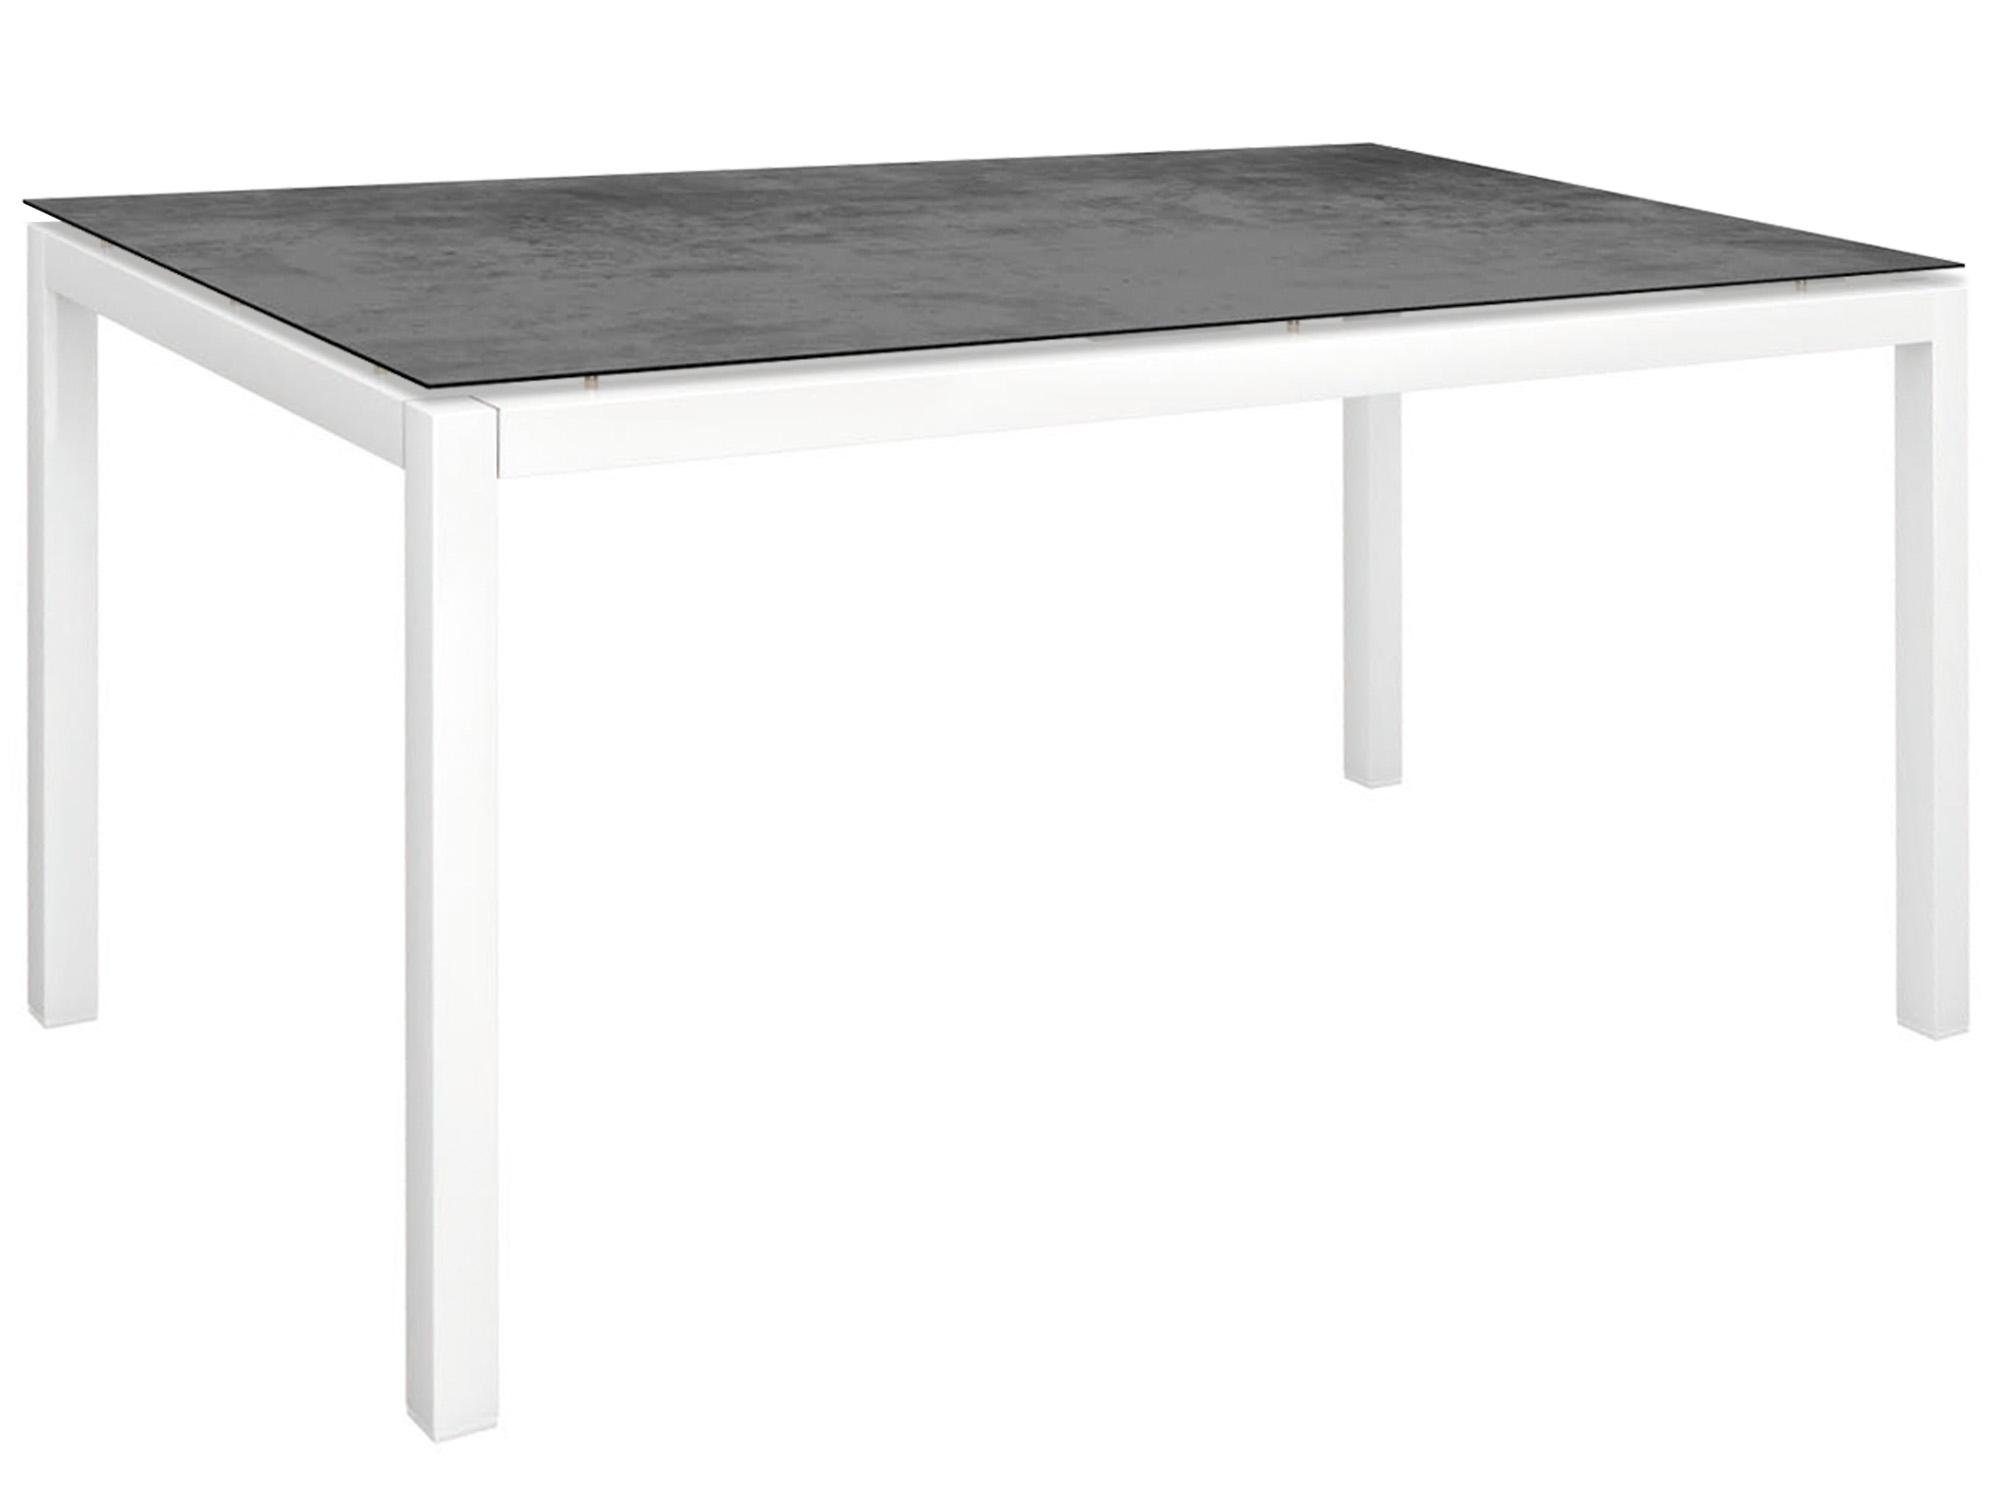 stern gartentisch 130x80cm aluminium wei silverstar 2 0 gartenm bel l nse. Black Bedroom Furniture Sets. Home Design Ideas